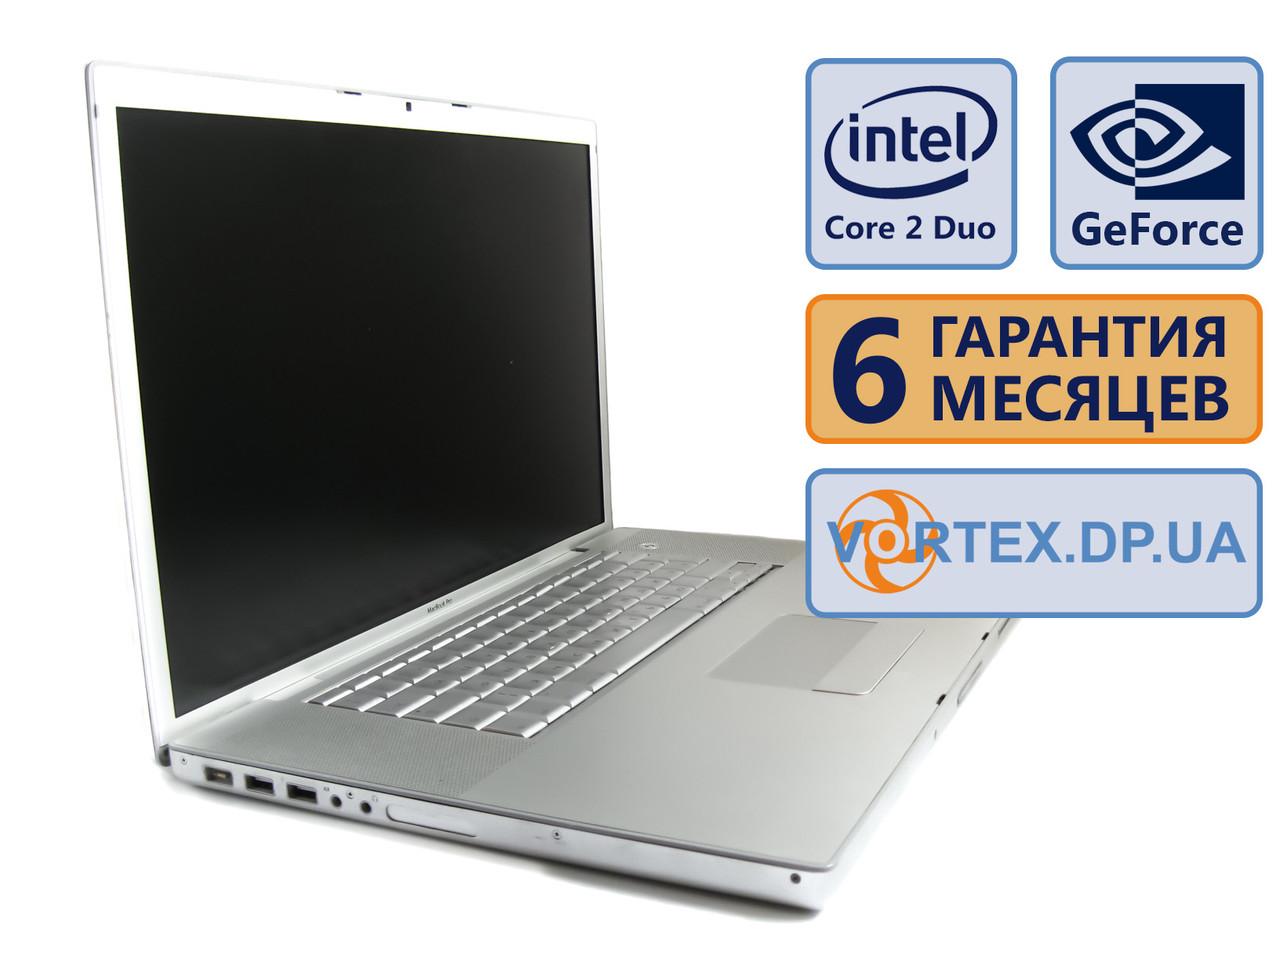 Ноутбук Apple A1229 17 (1440x900) / Intel Core 2 Duo T7700 (2x2.4GHz) / GeForce 8600M (НОВ) / RAM 4 Gb / HDD 250 Gb / АКБ нет / Сост. 9/10 БУ